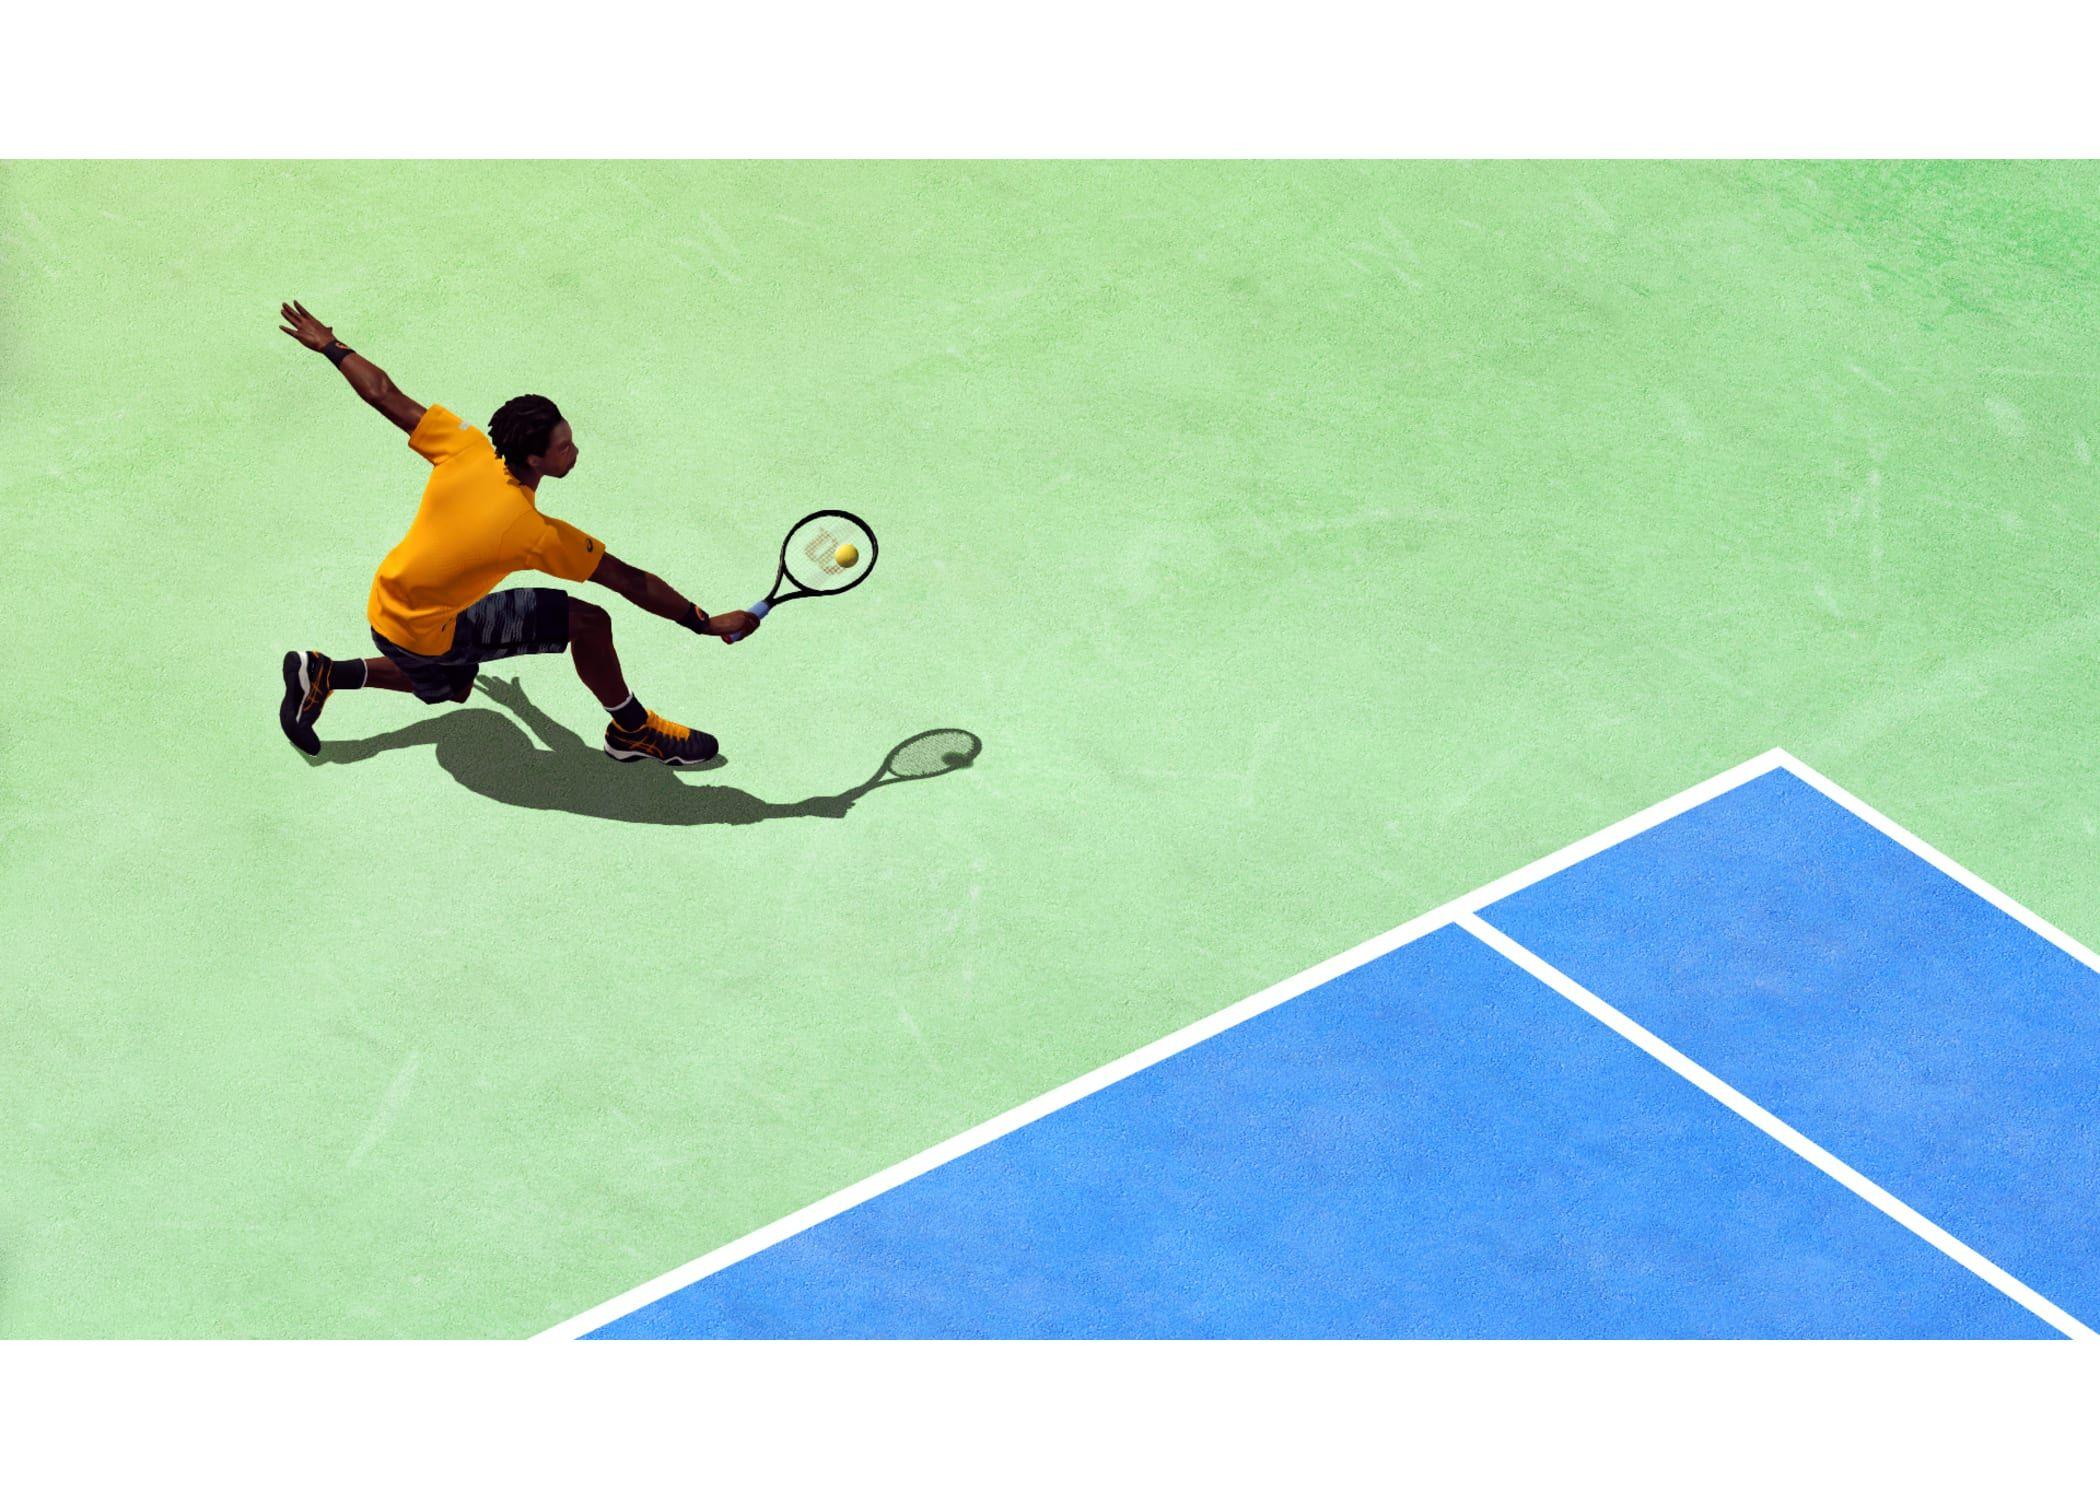 Tennis World Tour In 2020 Tennis World Tours Logo Facebook